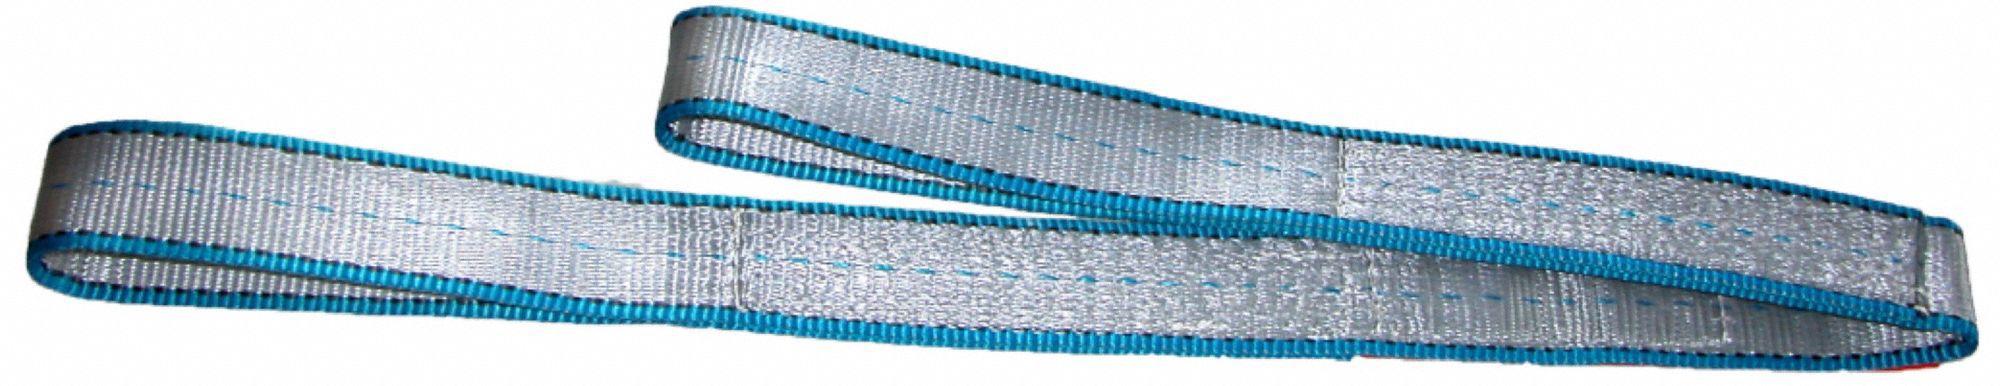 Tuff-Edge Polyester Number of Plies: 1 3 W Flat Eye and Eye Type 3 Web Sling 8 ft